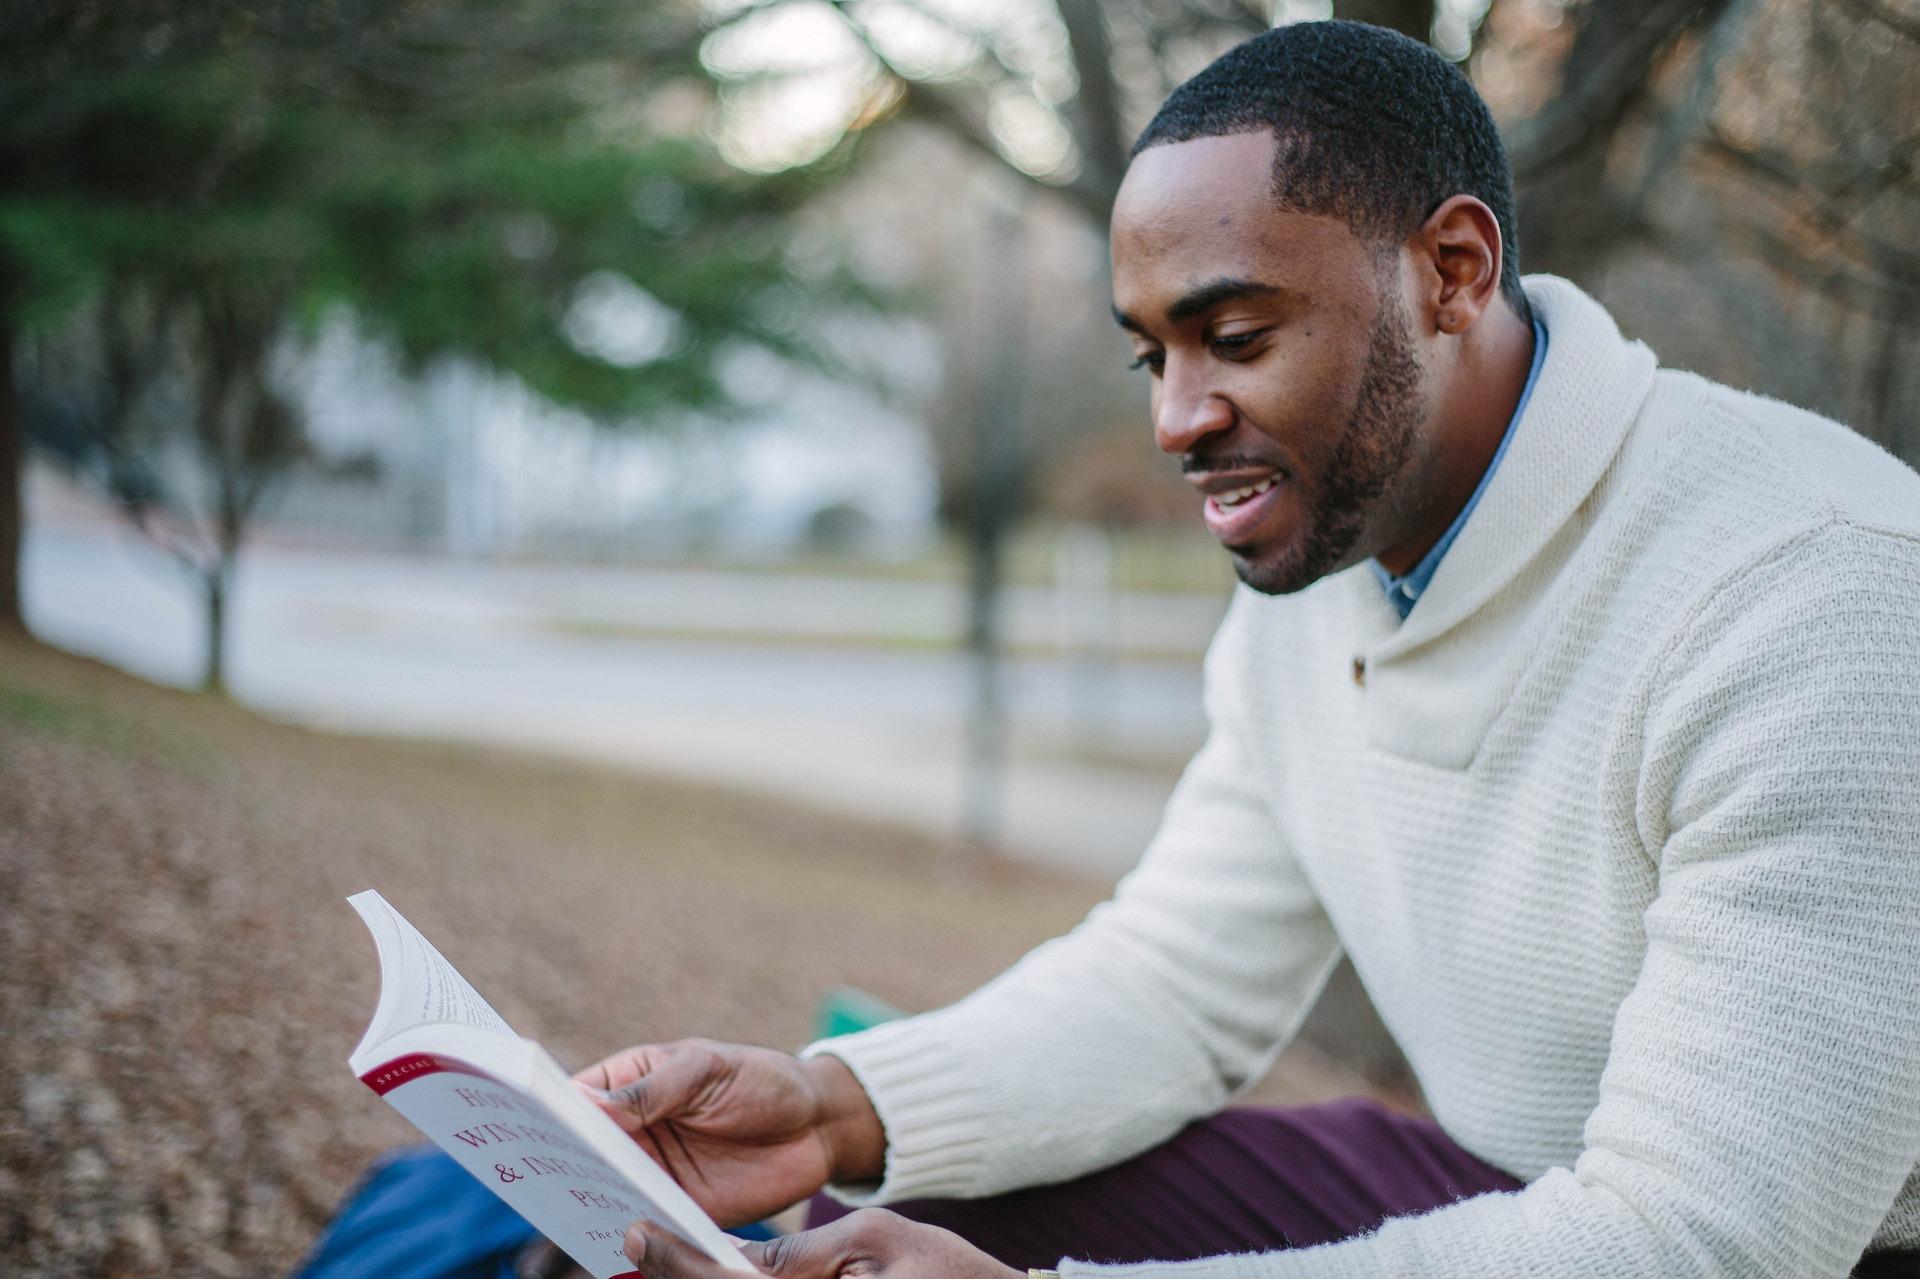 WPI Lenten Reading Recommendations